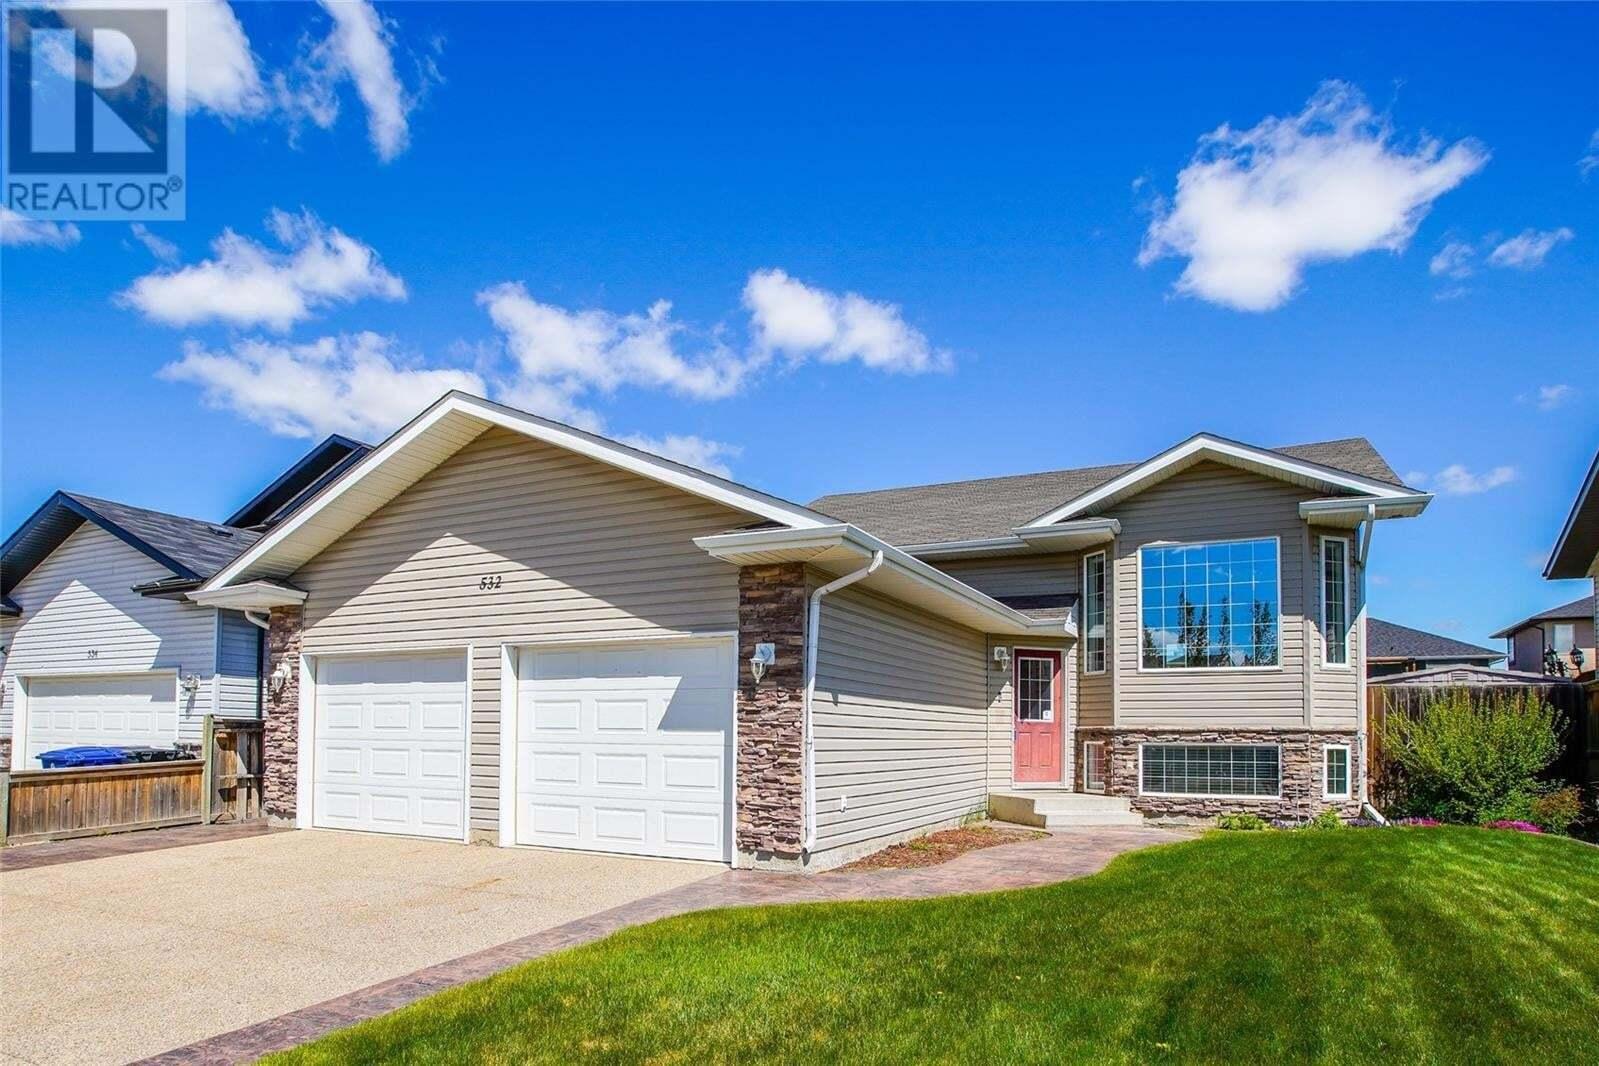 House for sale at 532 Ens Cres Warman Saskatchewan - MLS: SK810029